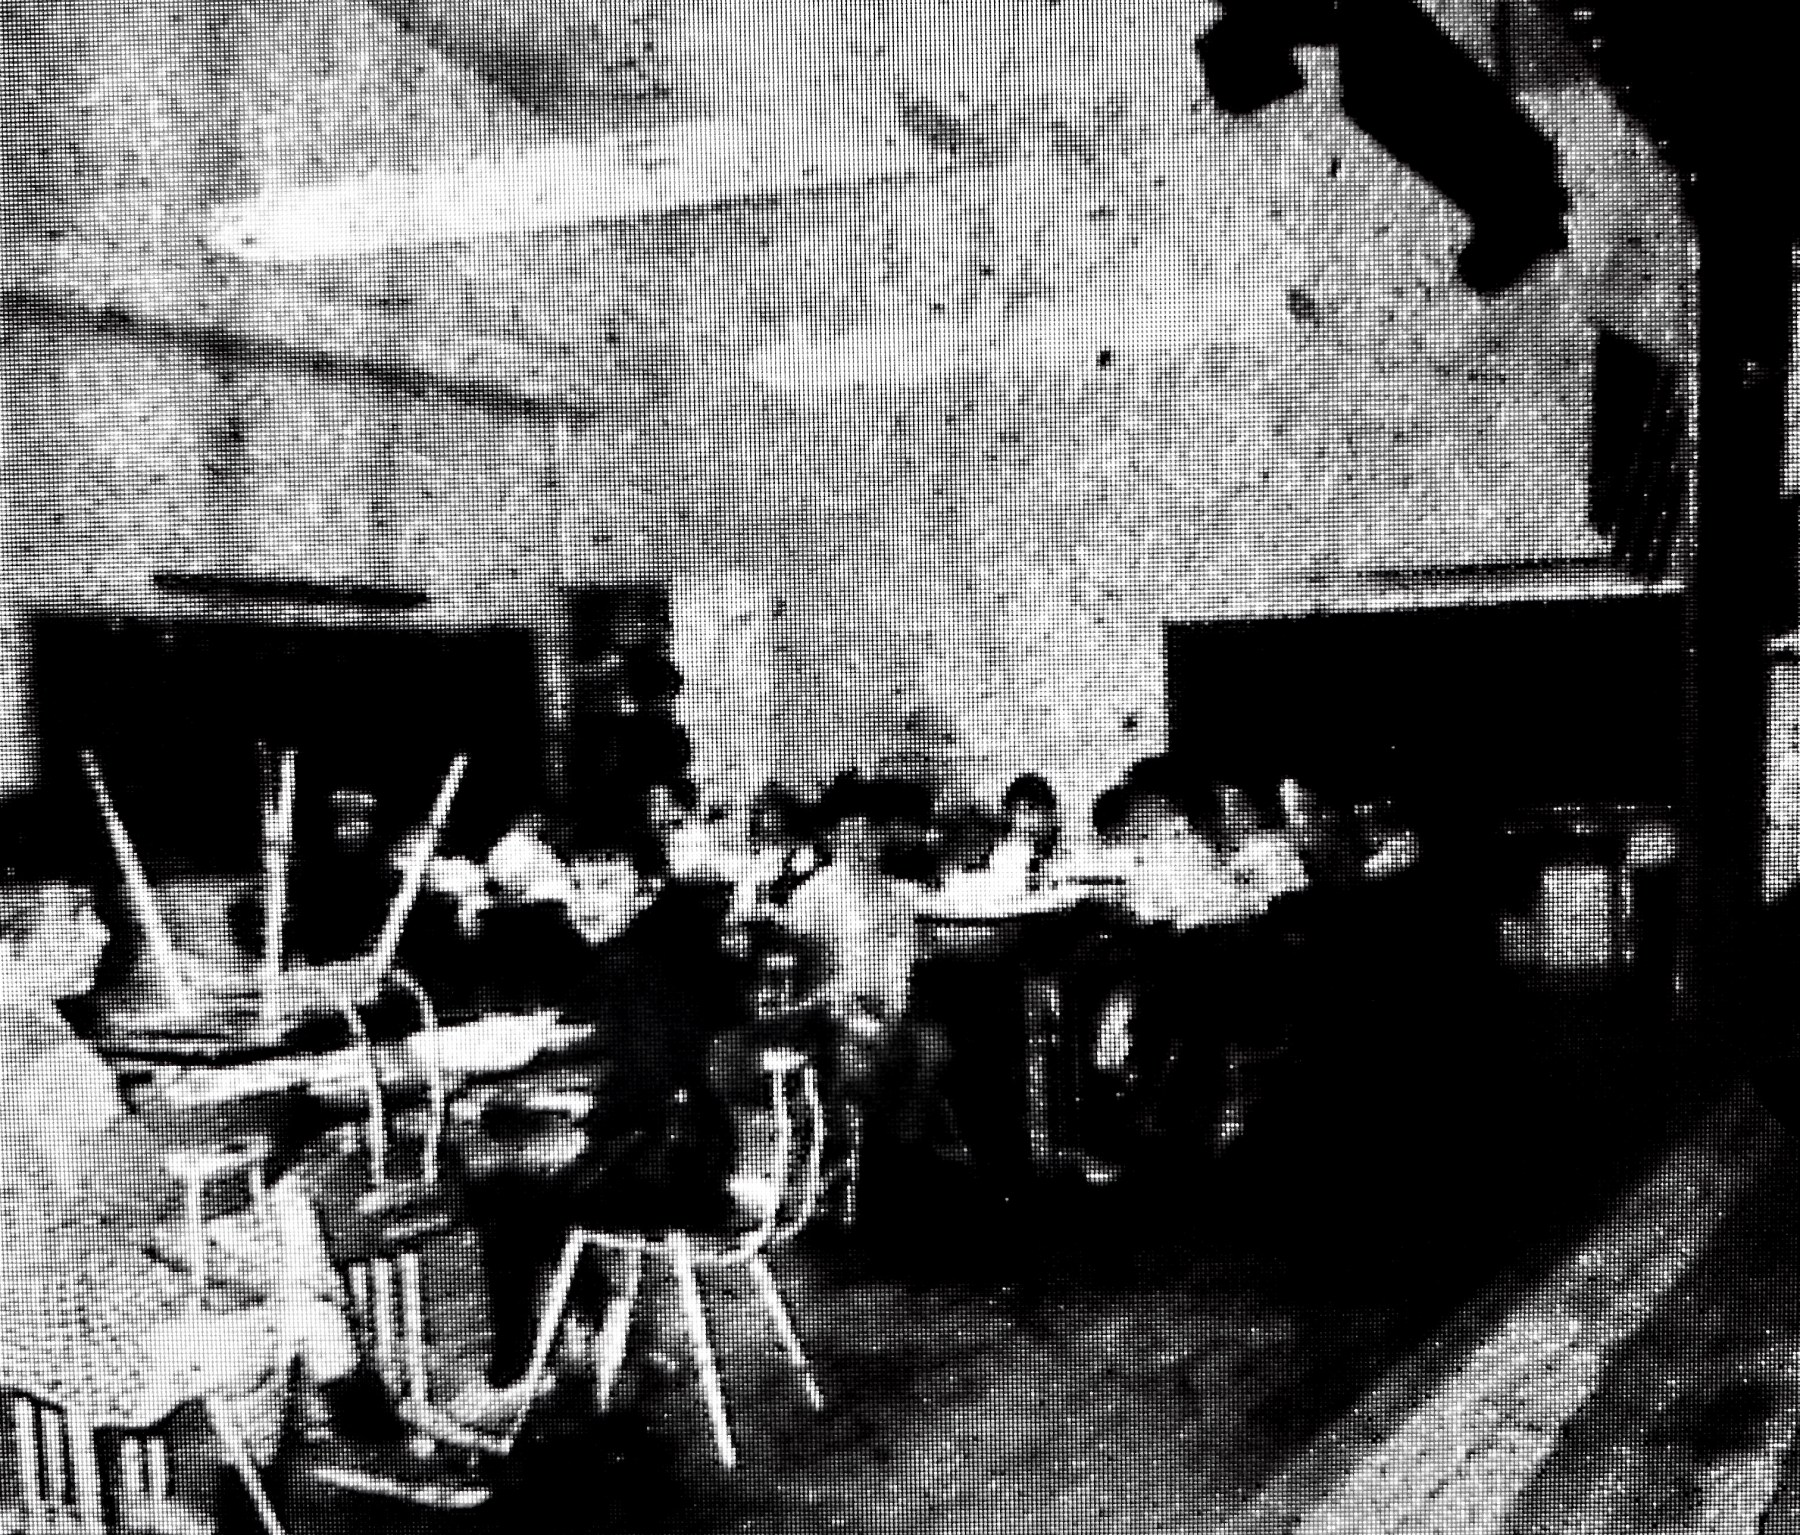 Wildwood classroom live onstage, Burlington MA